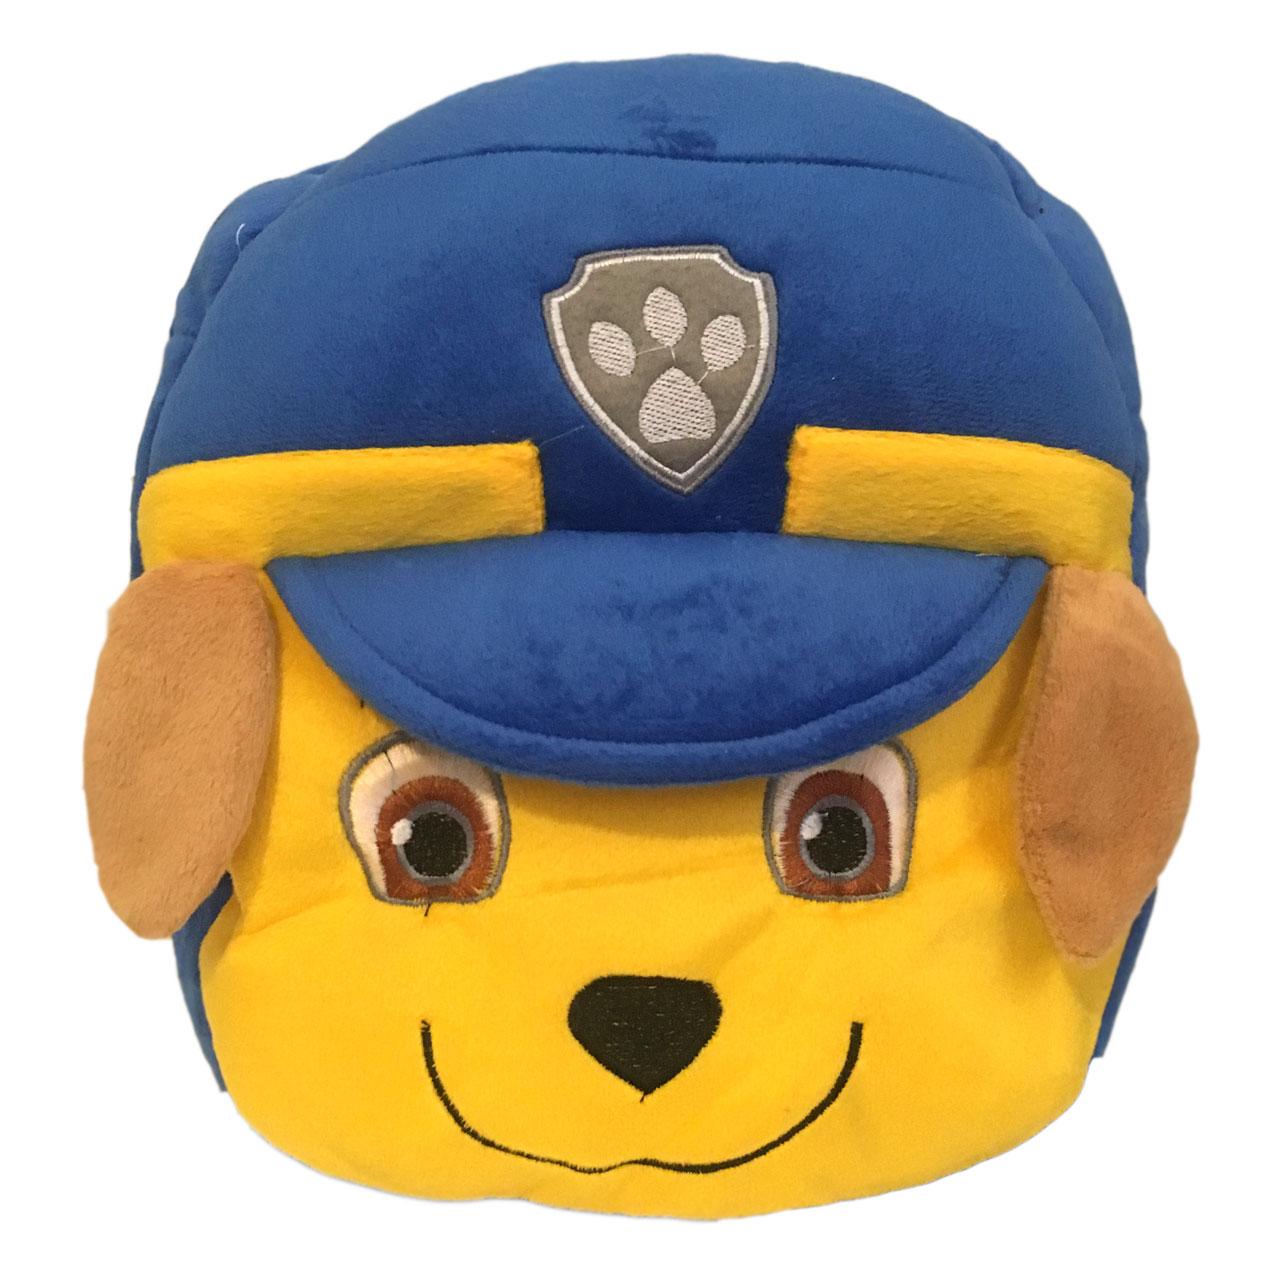 کوله طرح سگ نگهبان مدل Paw Patrol04